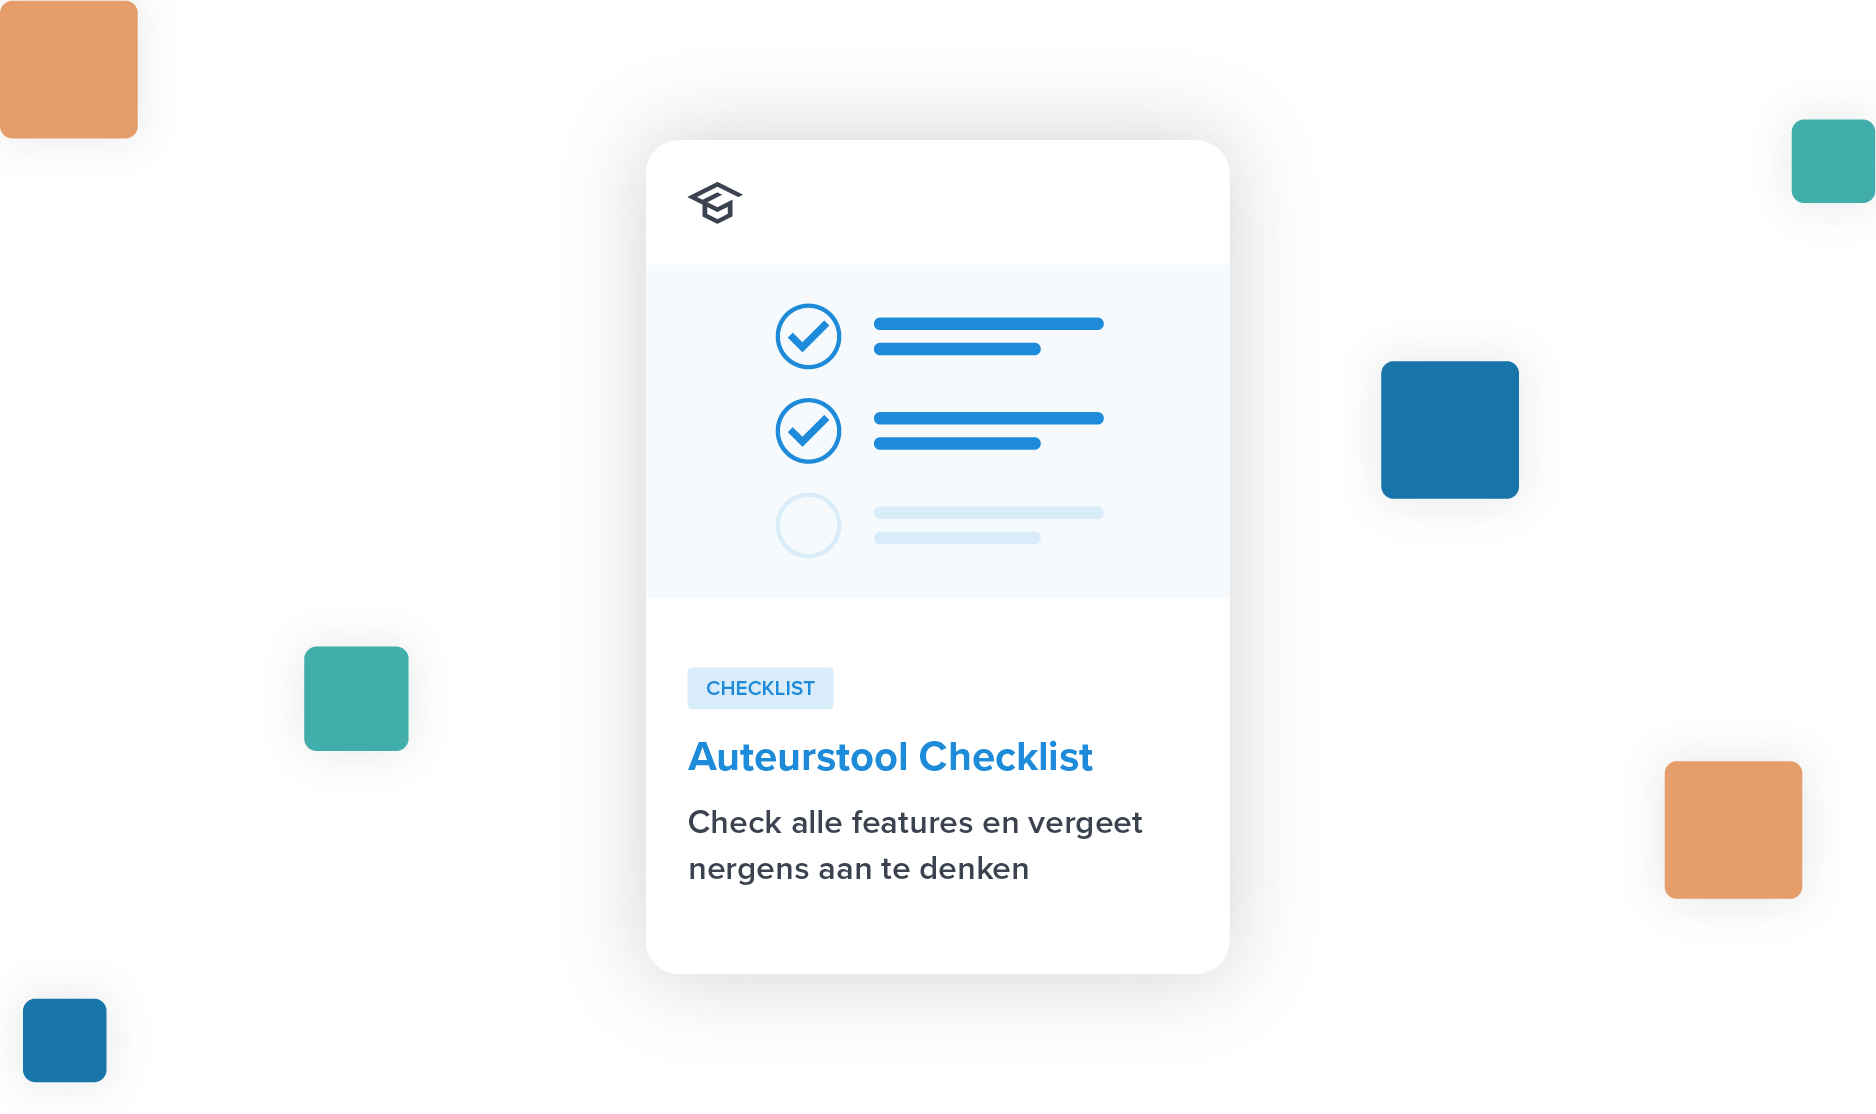 checklist auteurstool